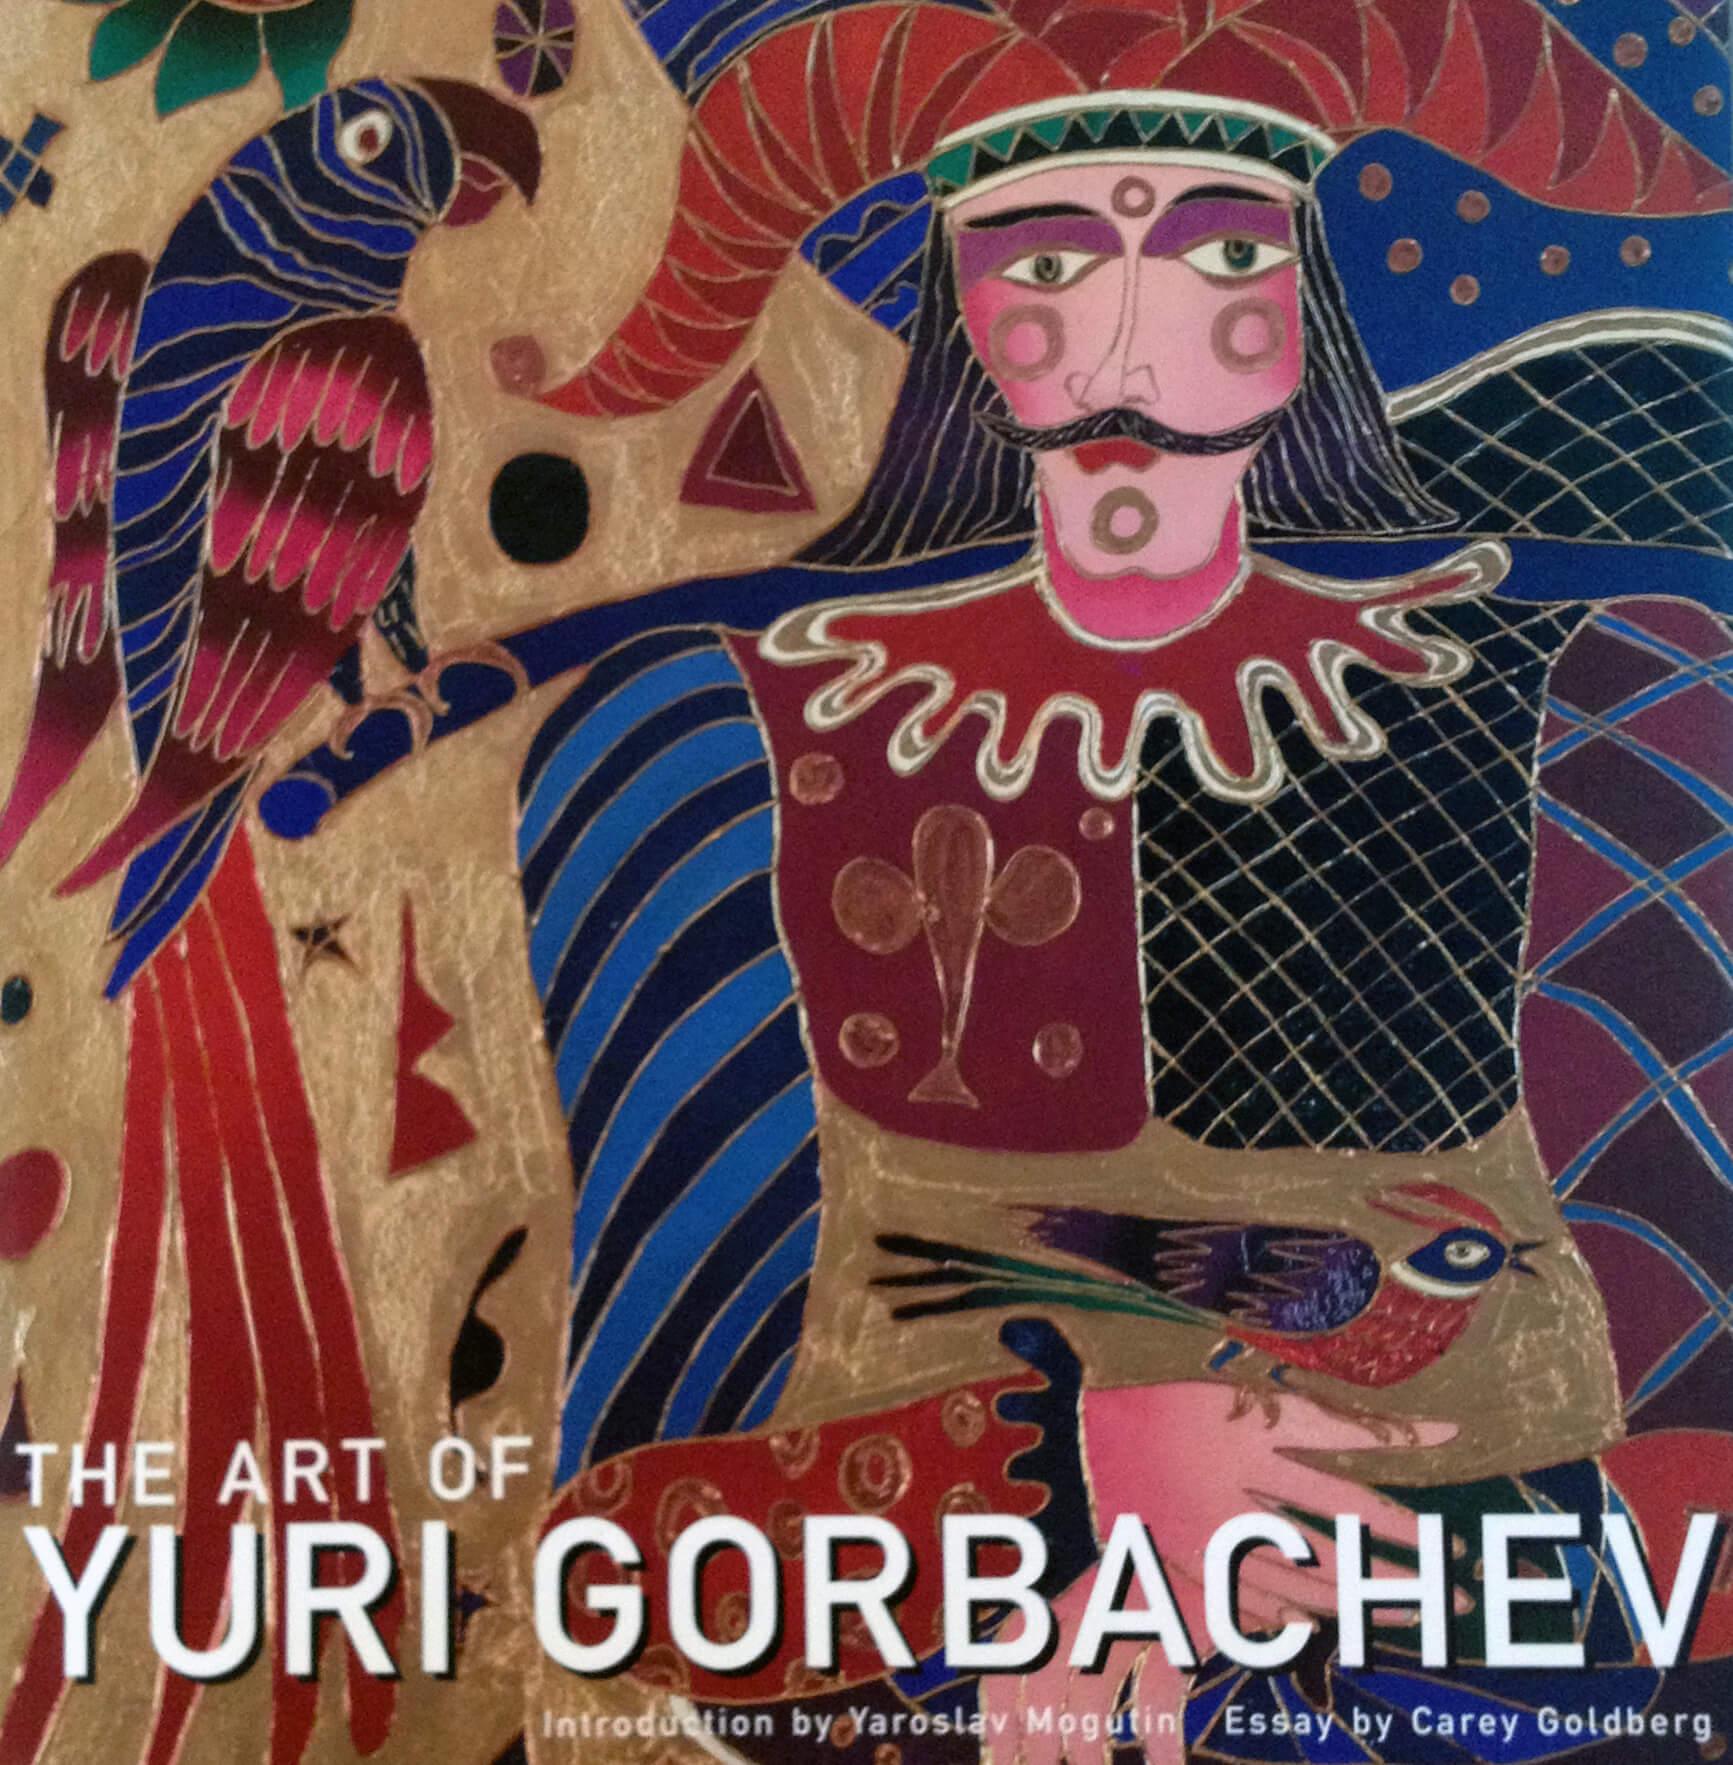 The Art of Yuri Gorbachev influences interior design